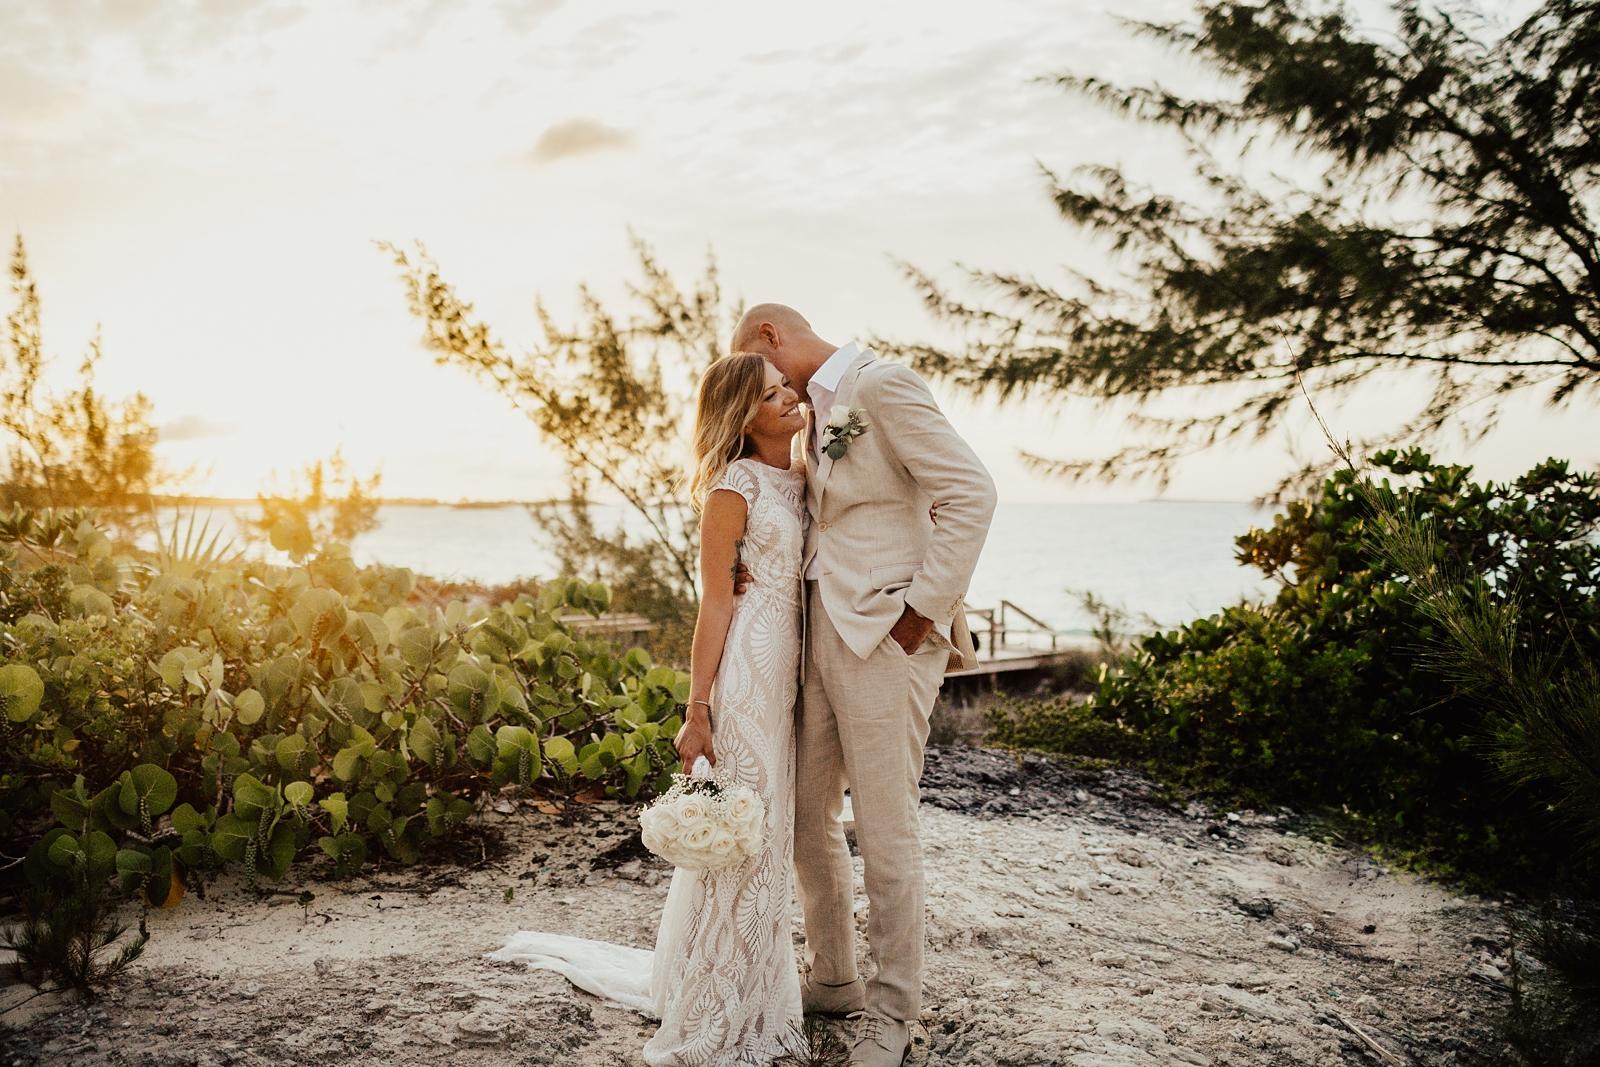 Jenni & Andrew Intimate Beach Destination Wedding in Little Exuma, Bahamas_0524.jpg